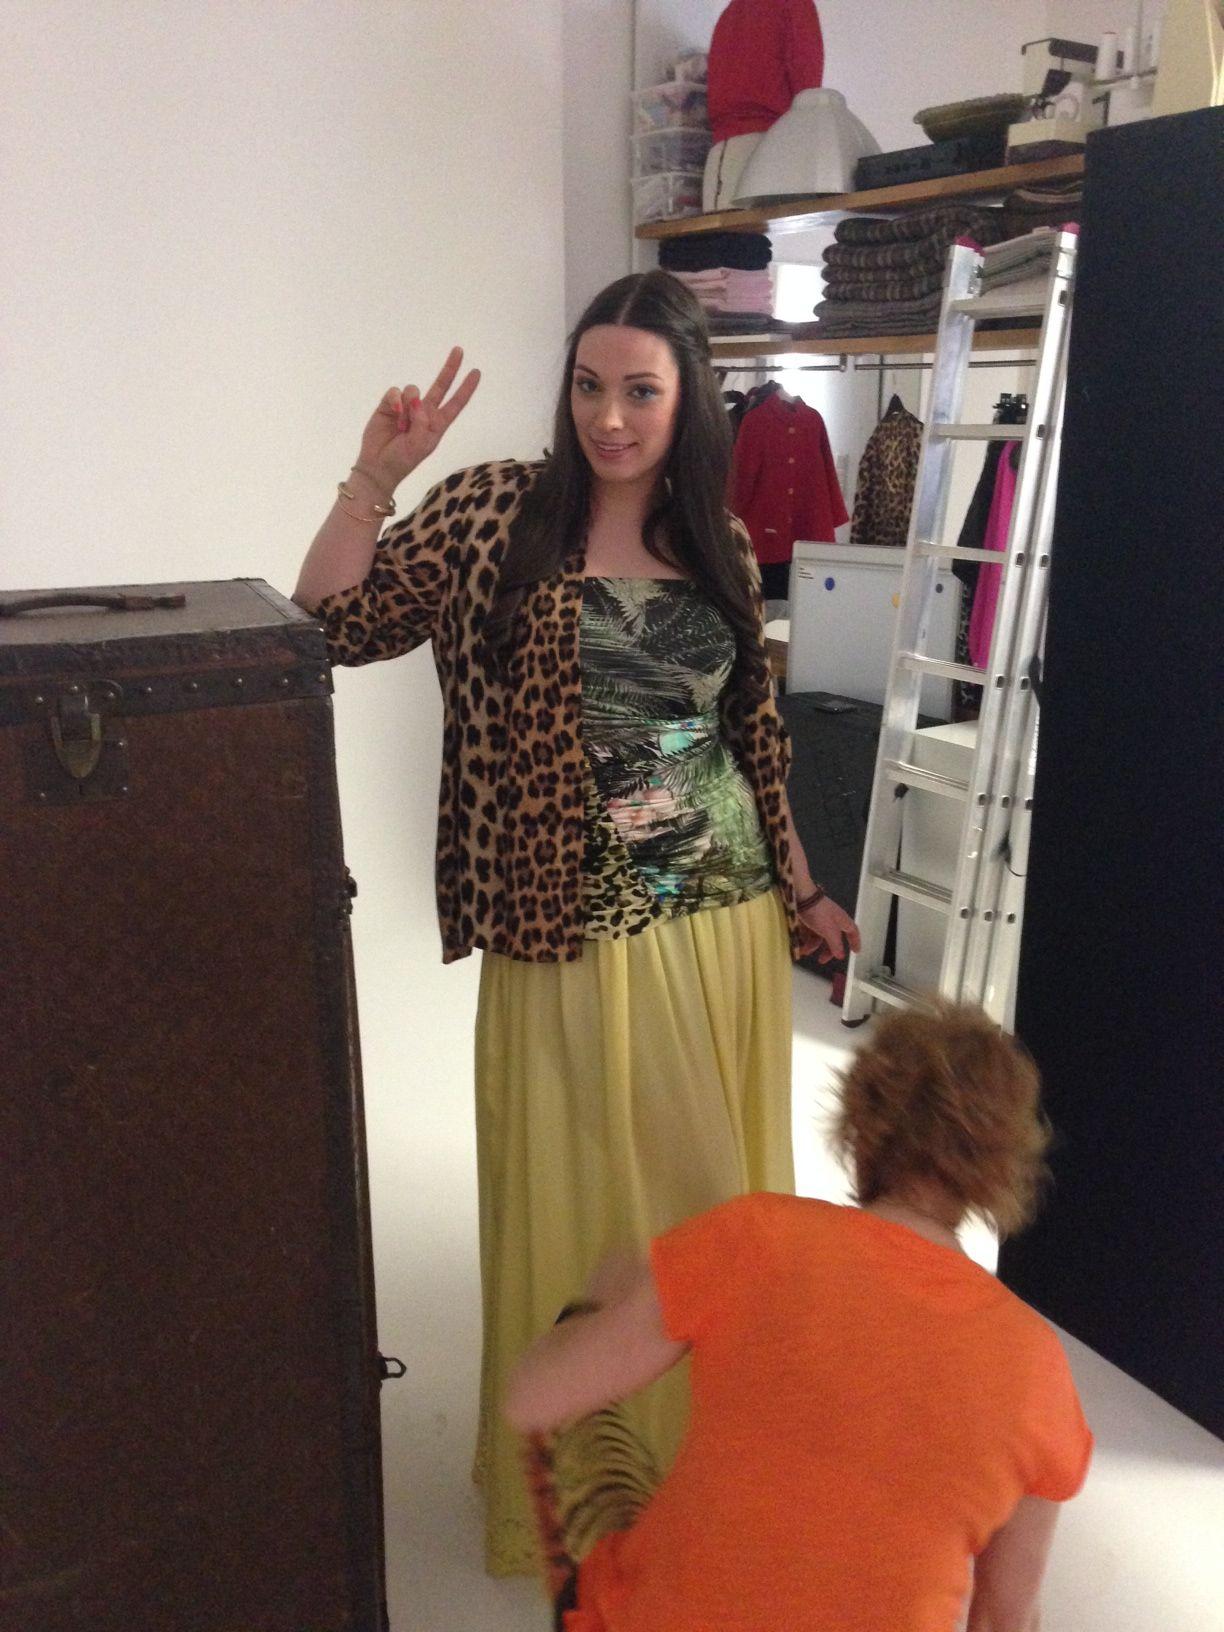 Hippie Girl in Leo - Model Silvana Denker & Designer Doris Megger #curvy, #curvyfashion